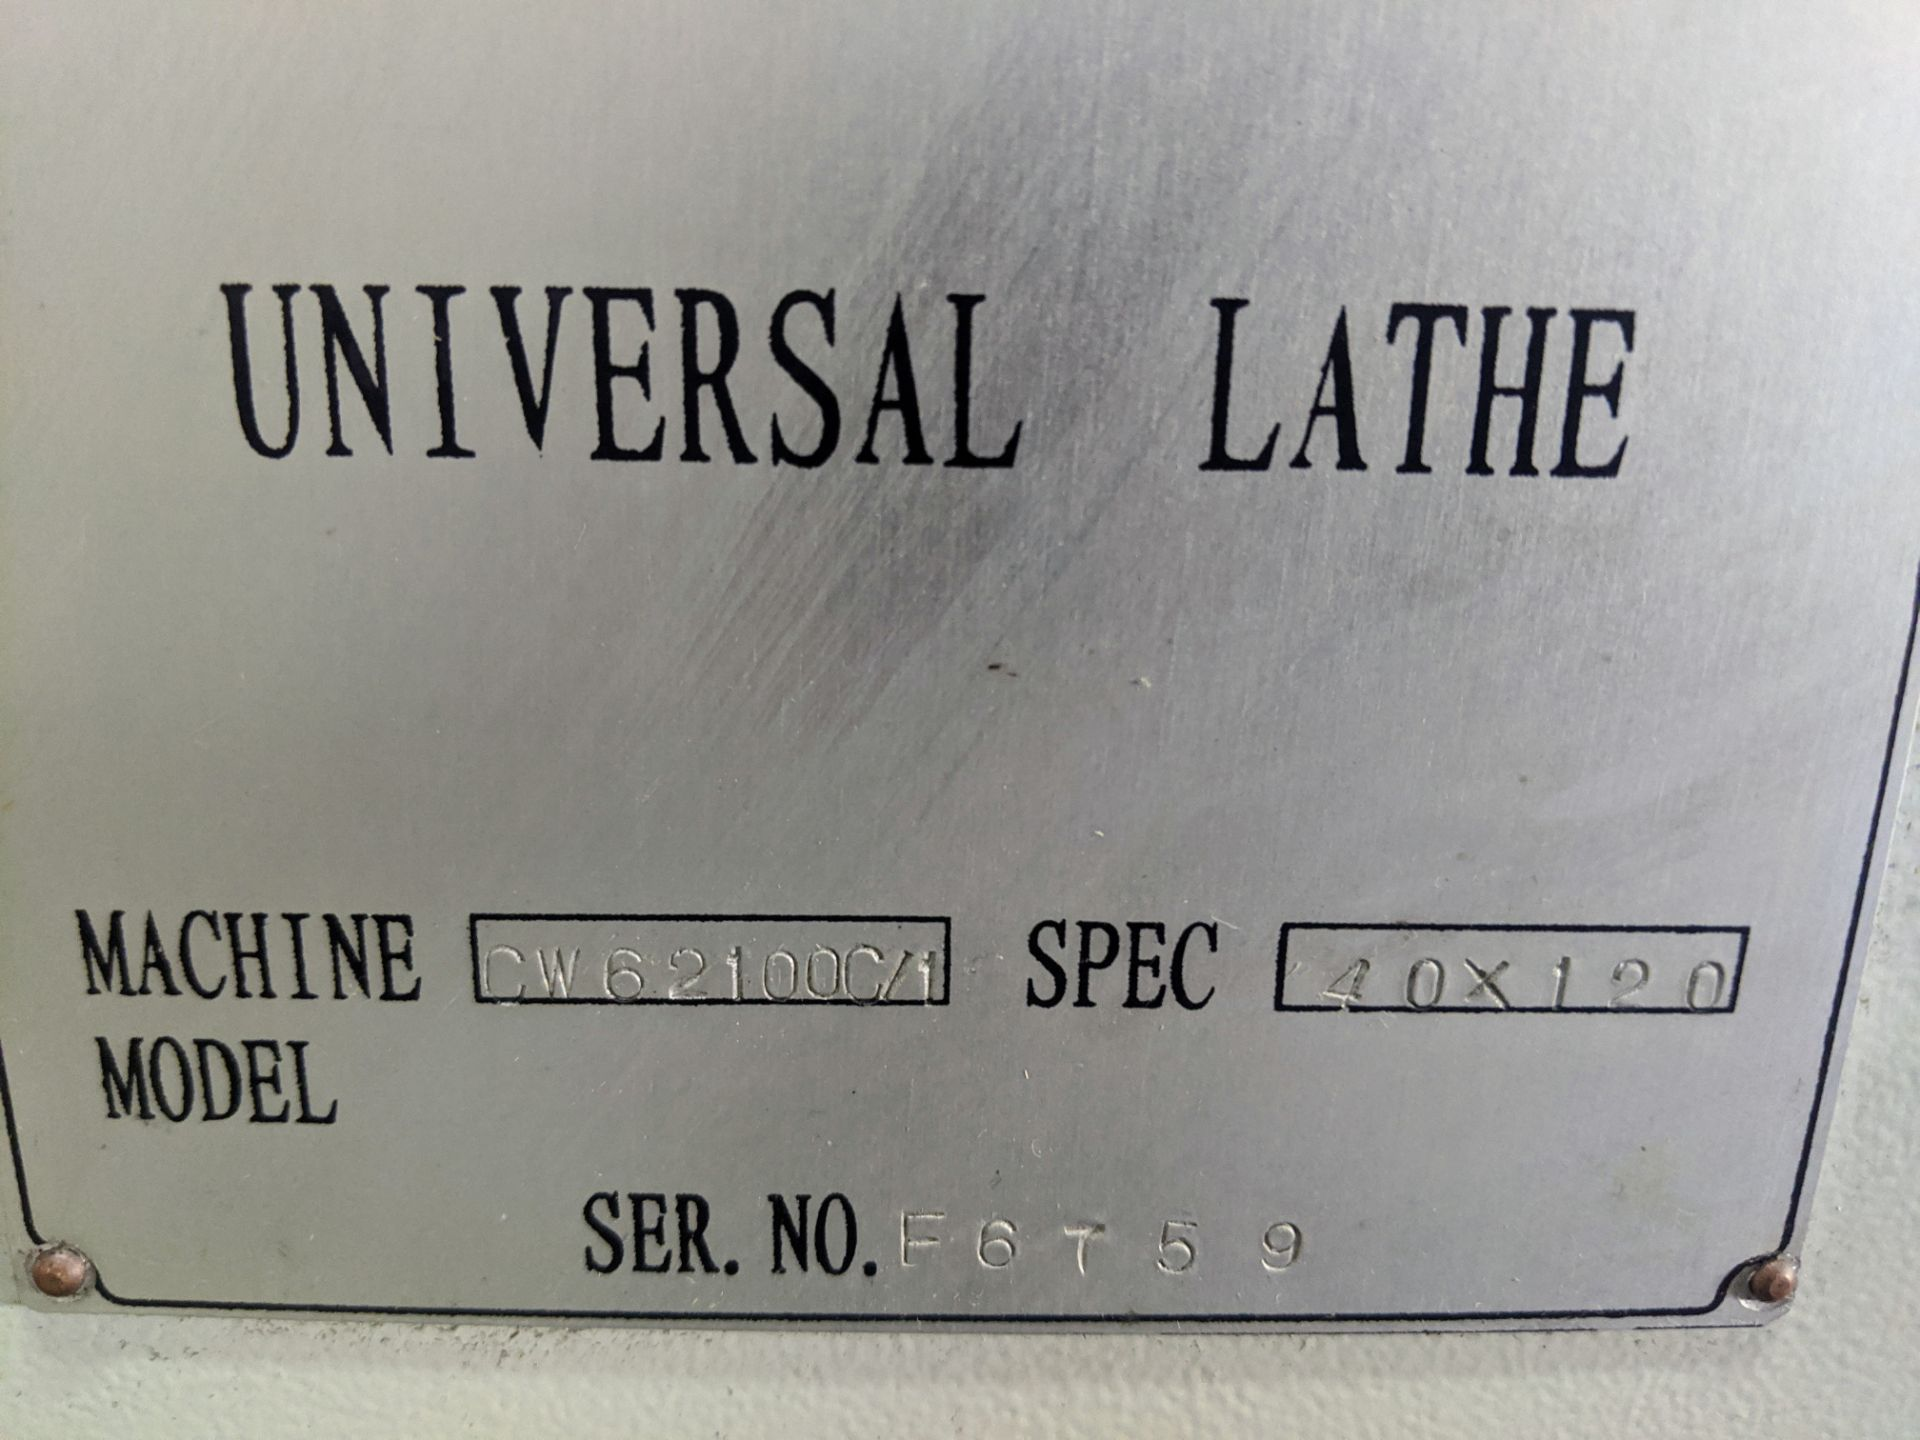 "Lot 13 - 2010 DMTG CW62100C/1 Lathe, 40"" x 120"", 25"" 4-Jaw Chuck, 5"" Bore, Speeds to 1,000 RPM, Tool Post,"